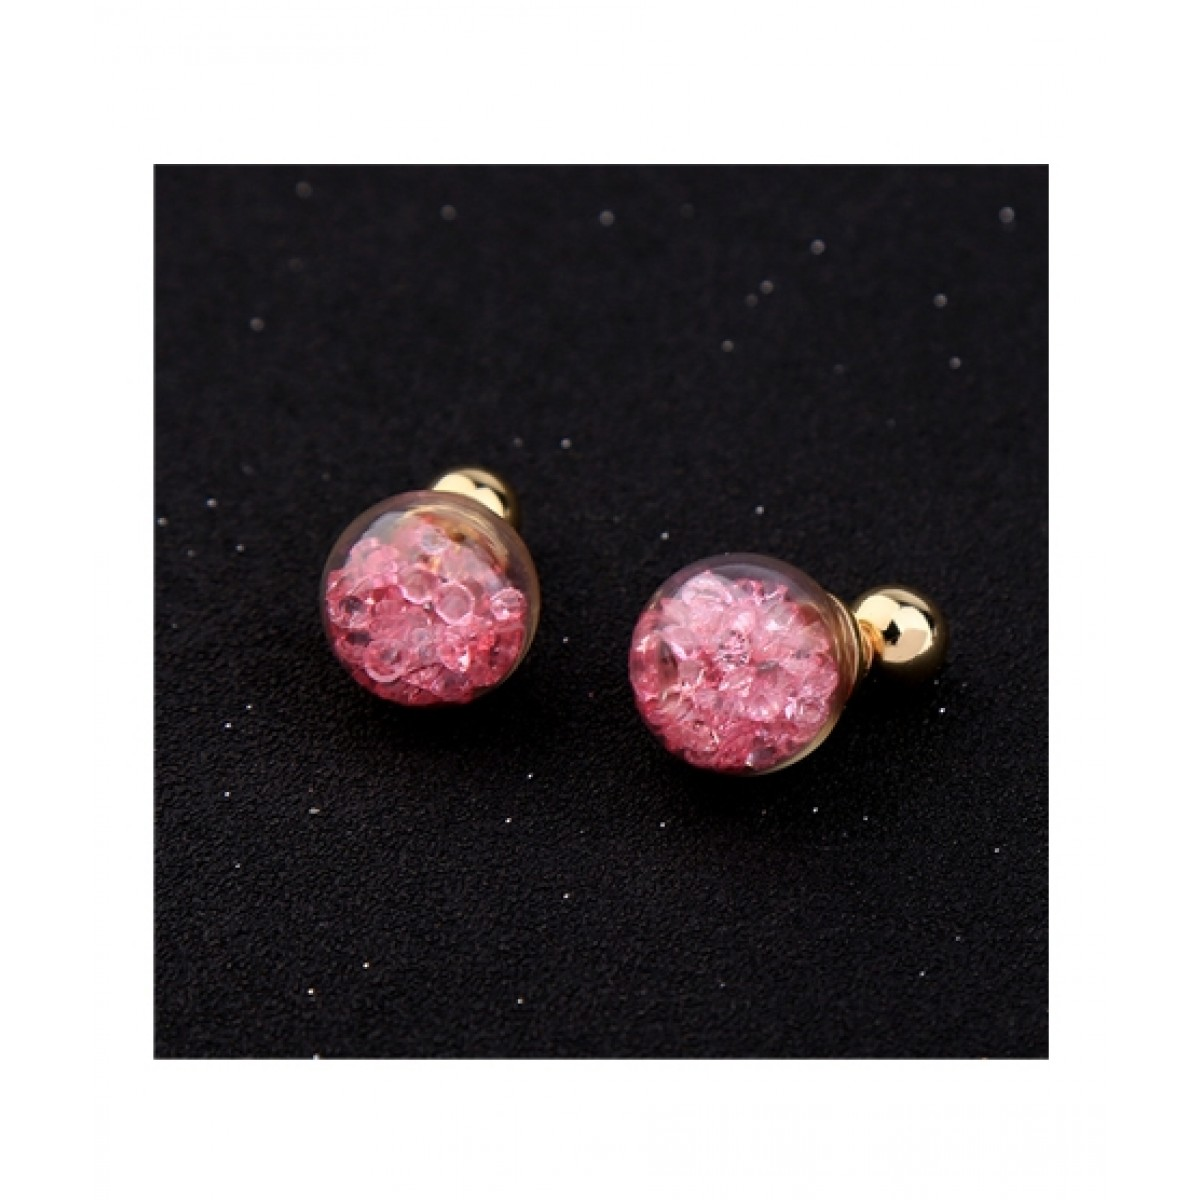 Jewelsgems Occident Small Star Beads Steel Ear Studs Pink For Women